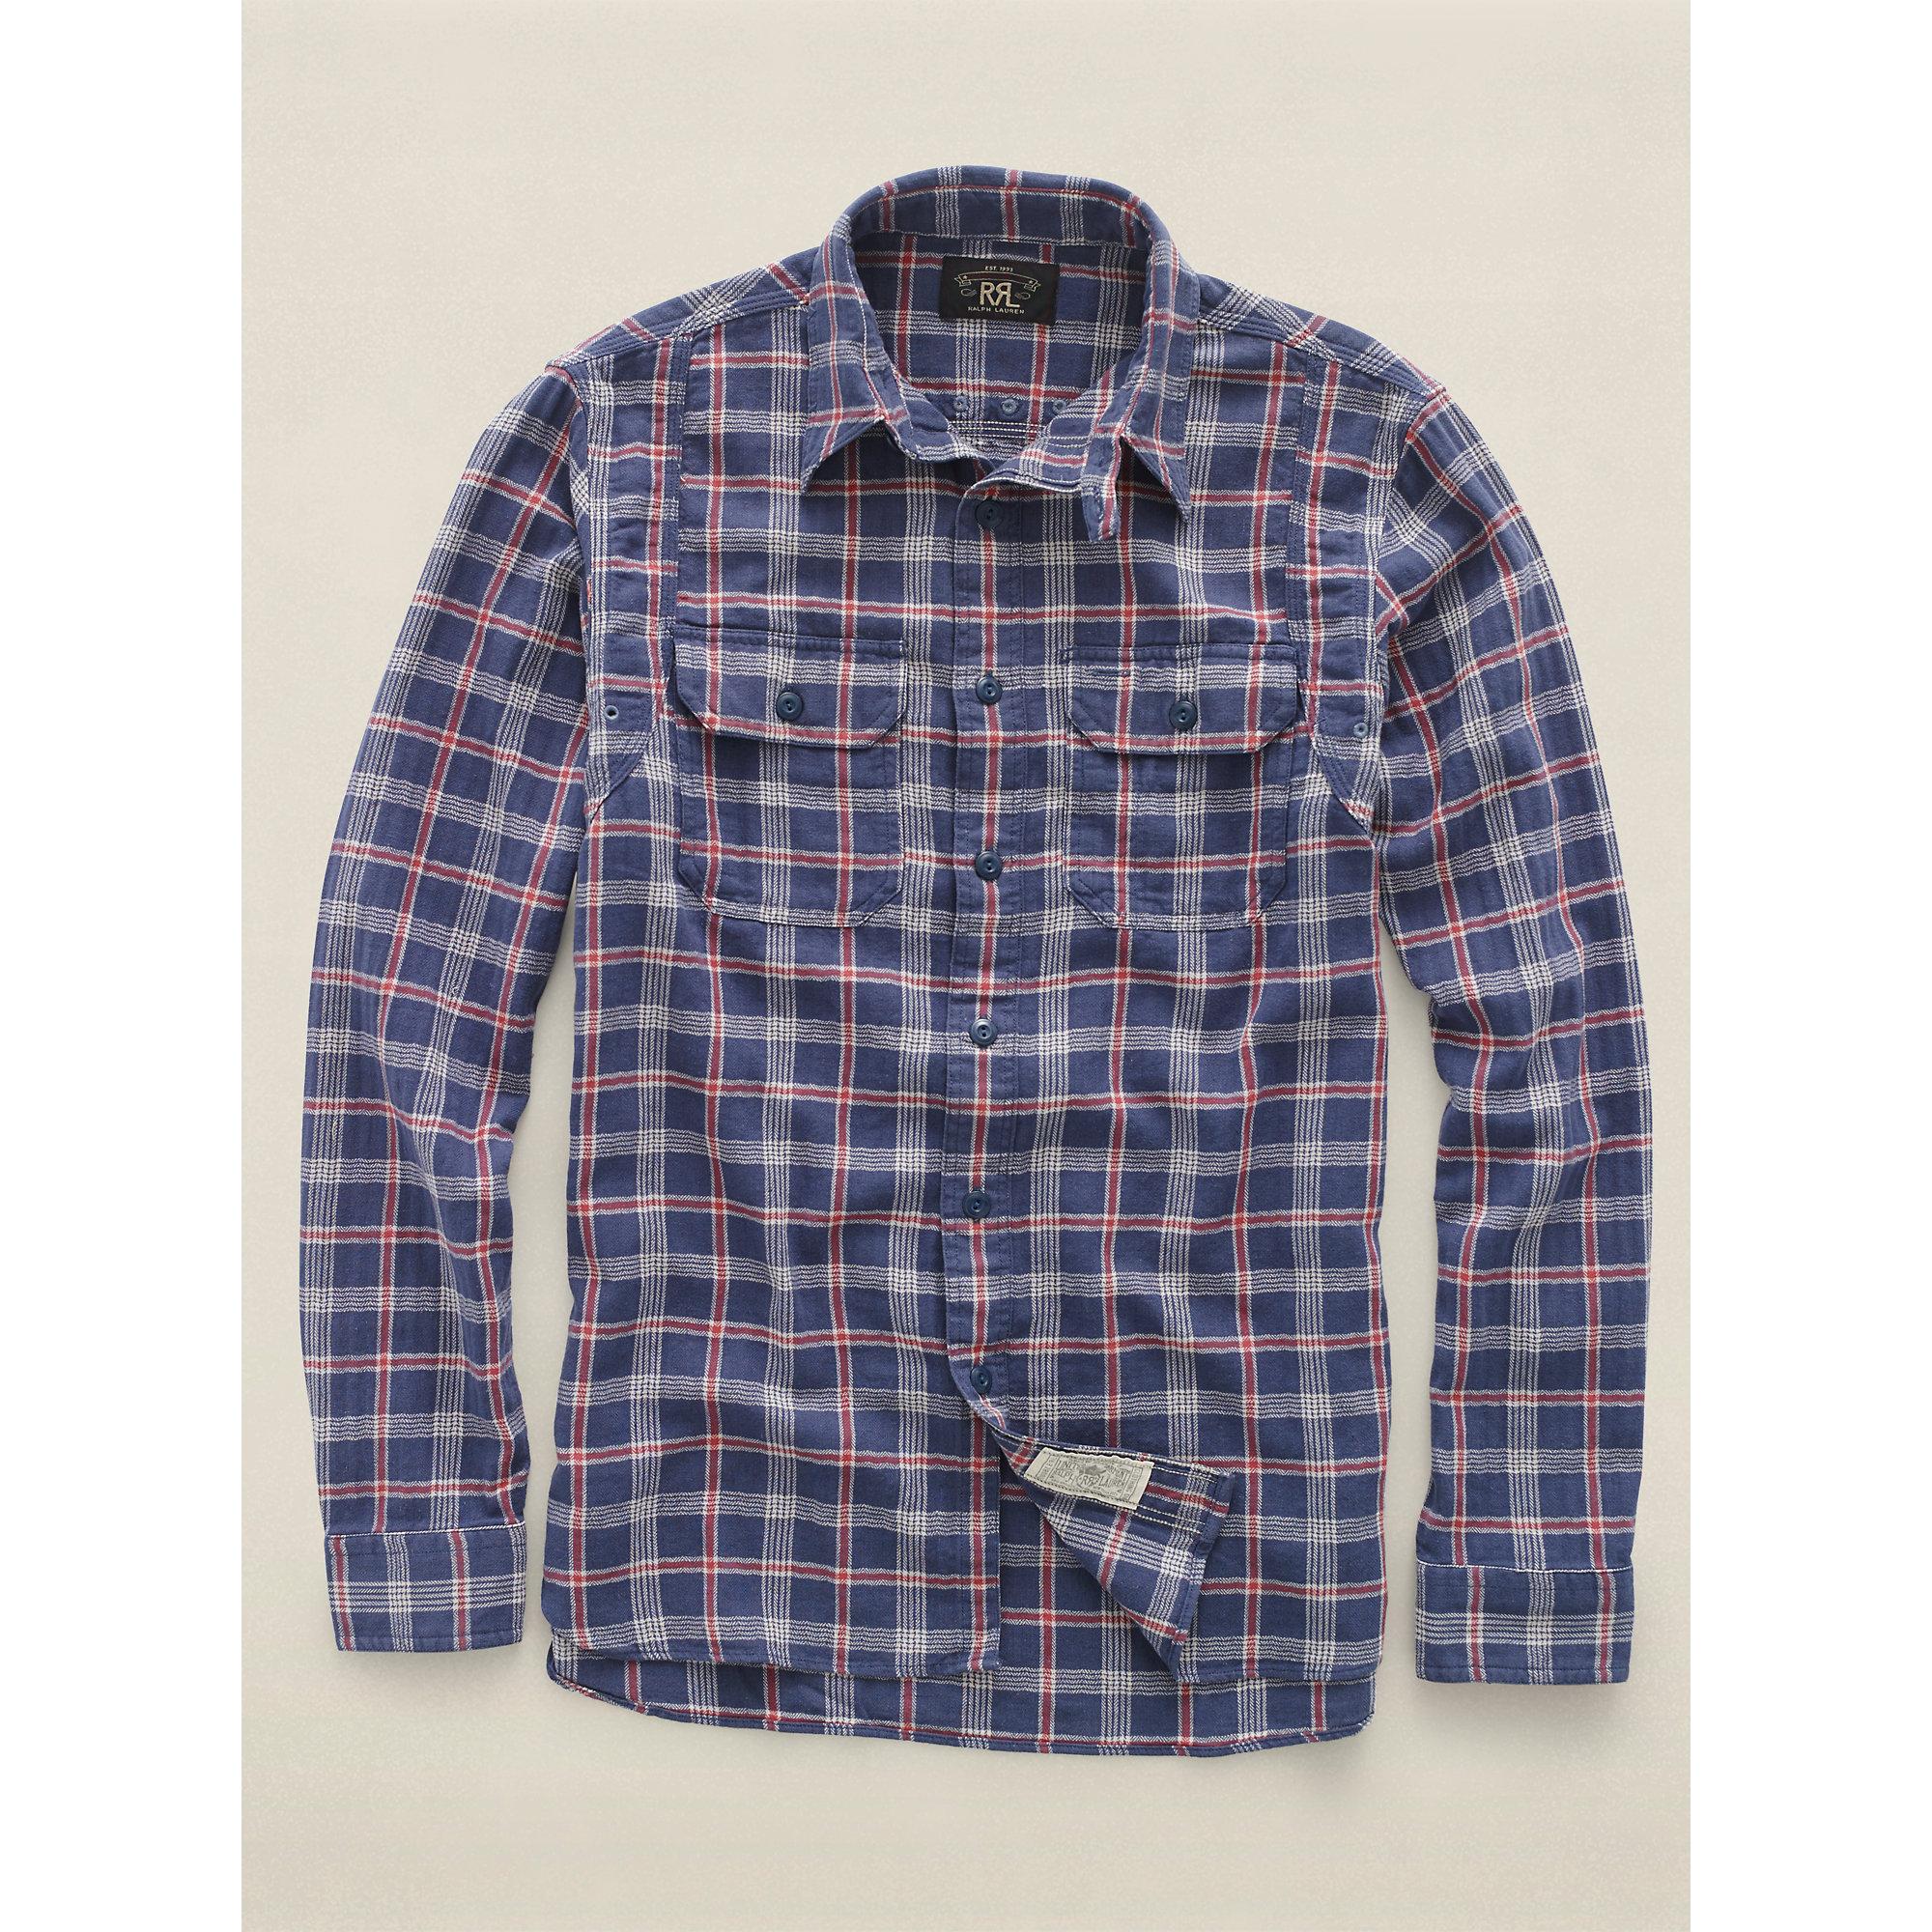 b75c5fba5f3 Lyst - Rrl Check Shirt in Brown for Men